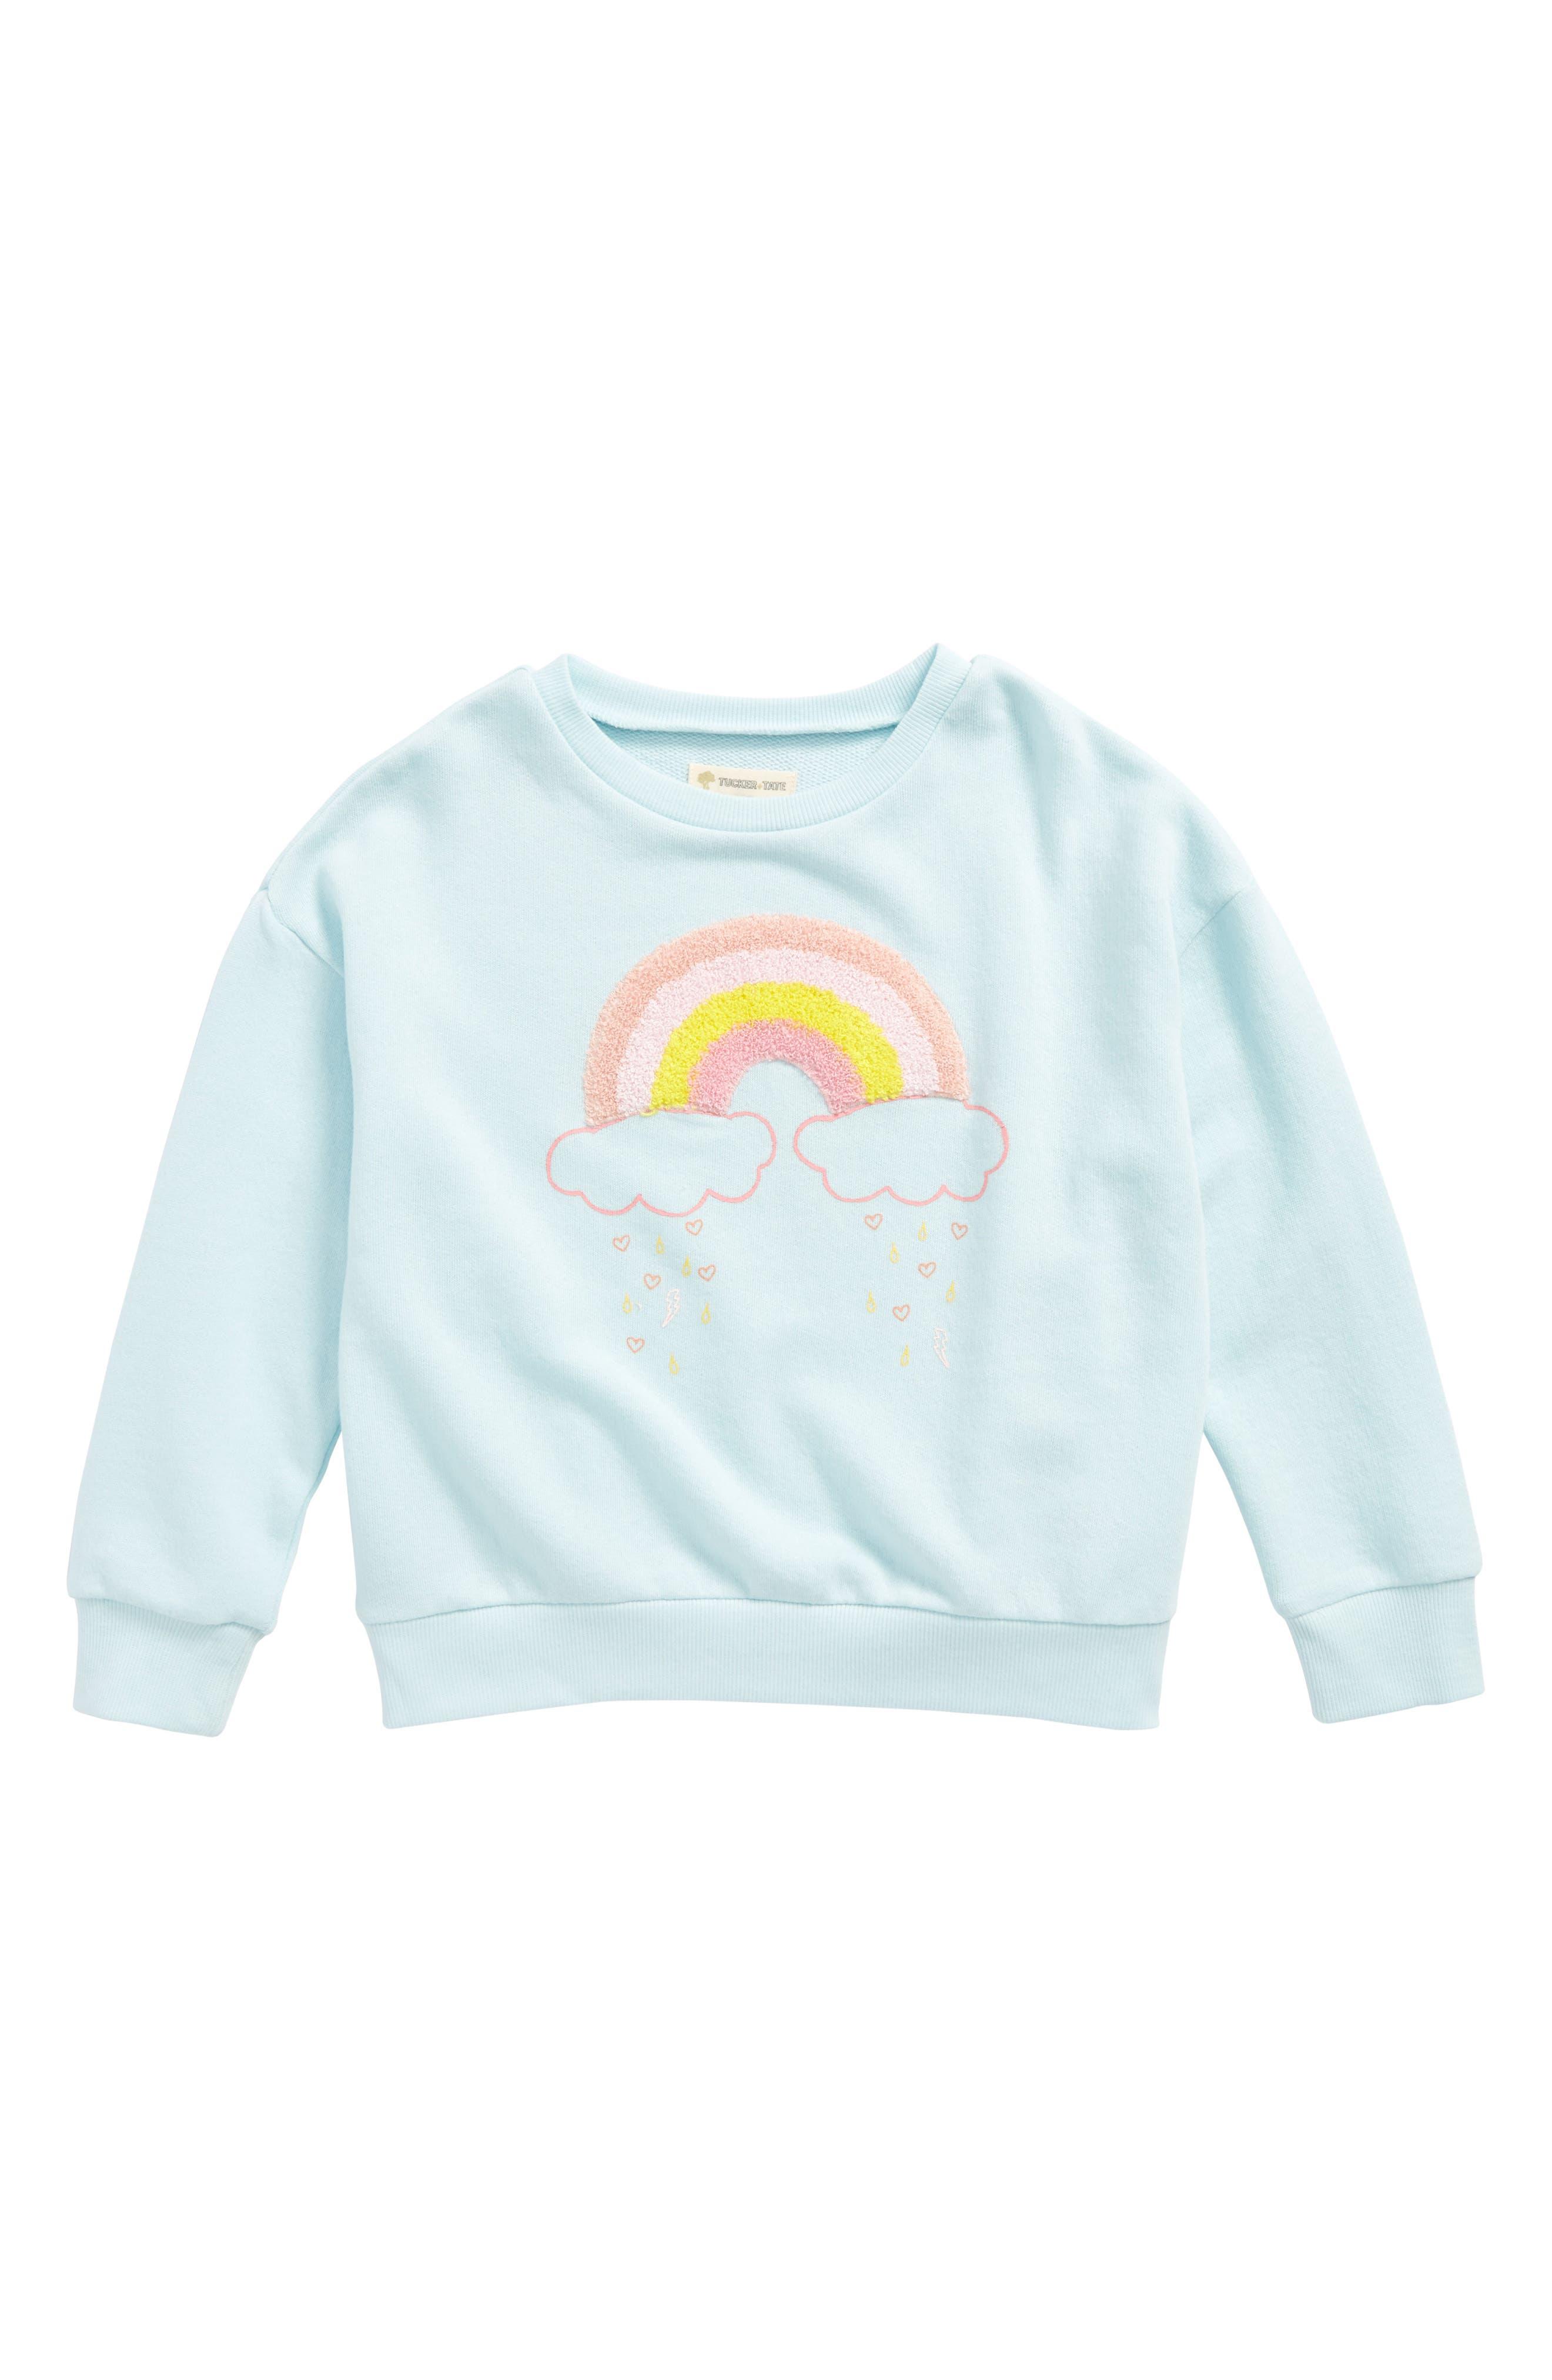 Rainbow Appliqué Sweatshirt,                             Main thumbnail 1, color,                             Blue Glow Rainbow